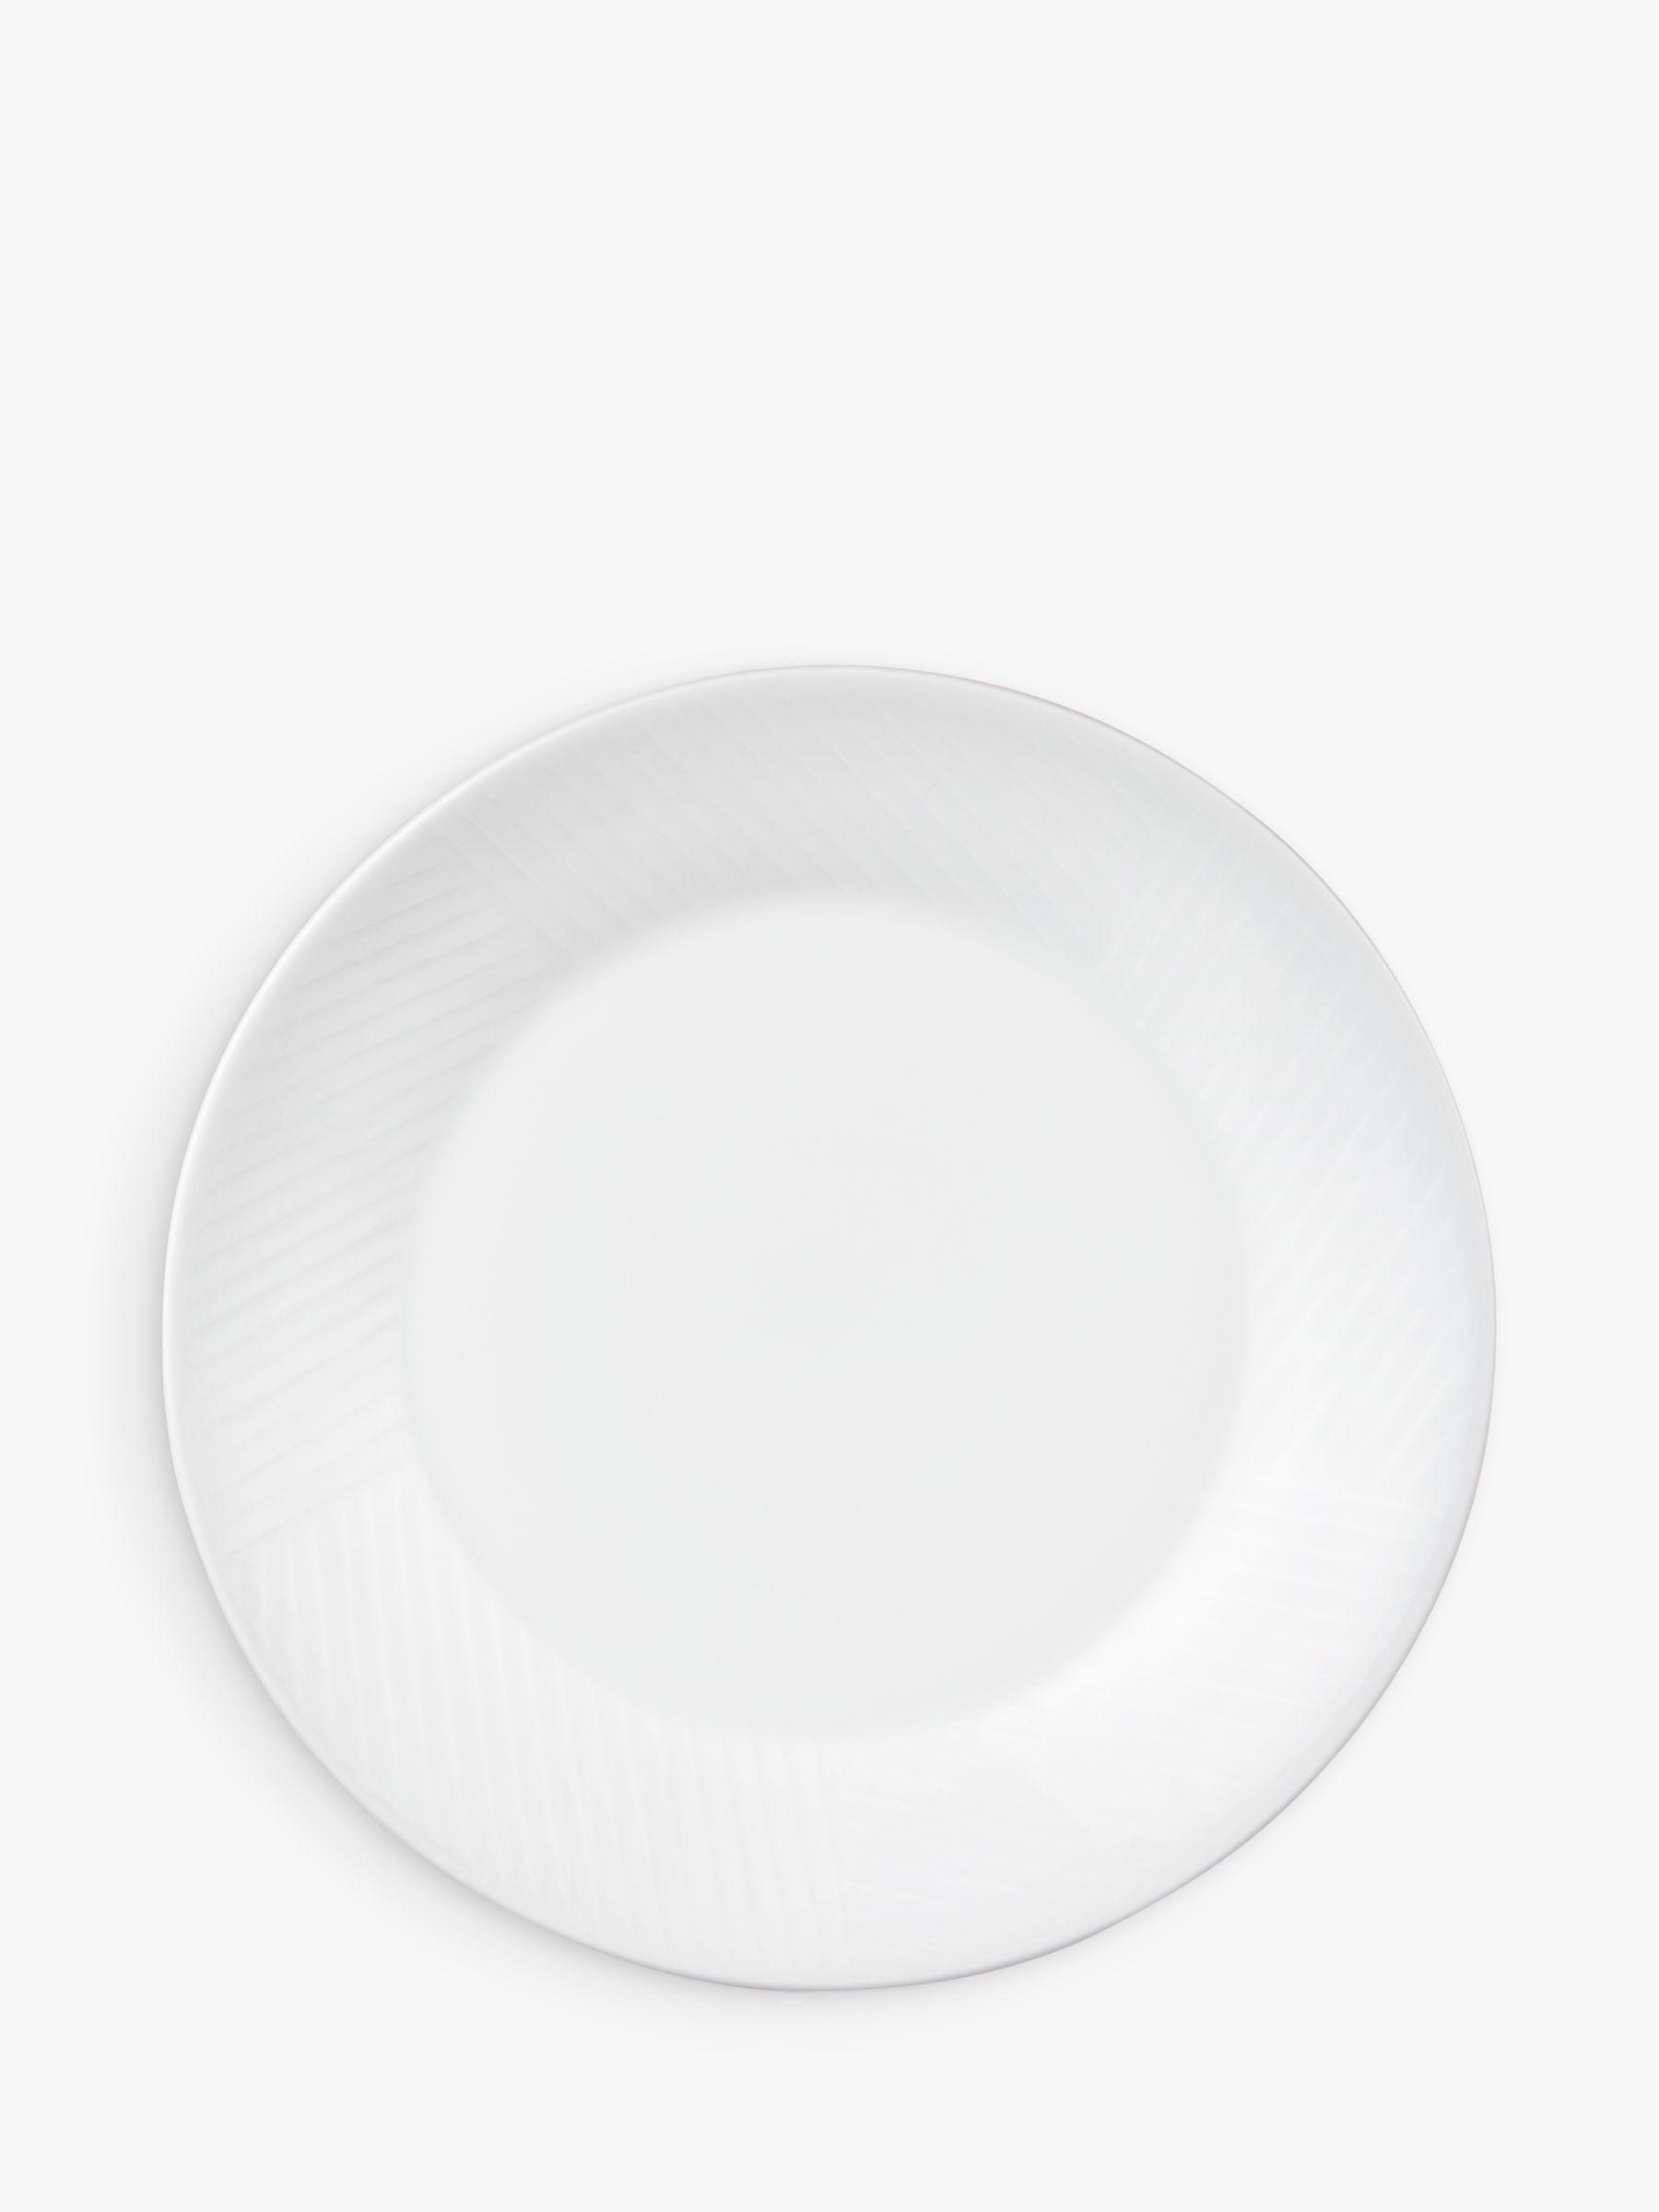 Design Project by John Lewis Design Project by John Lewis No.098 Rim 17cm Plate